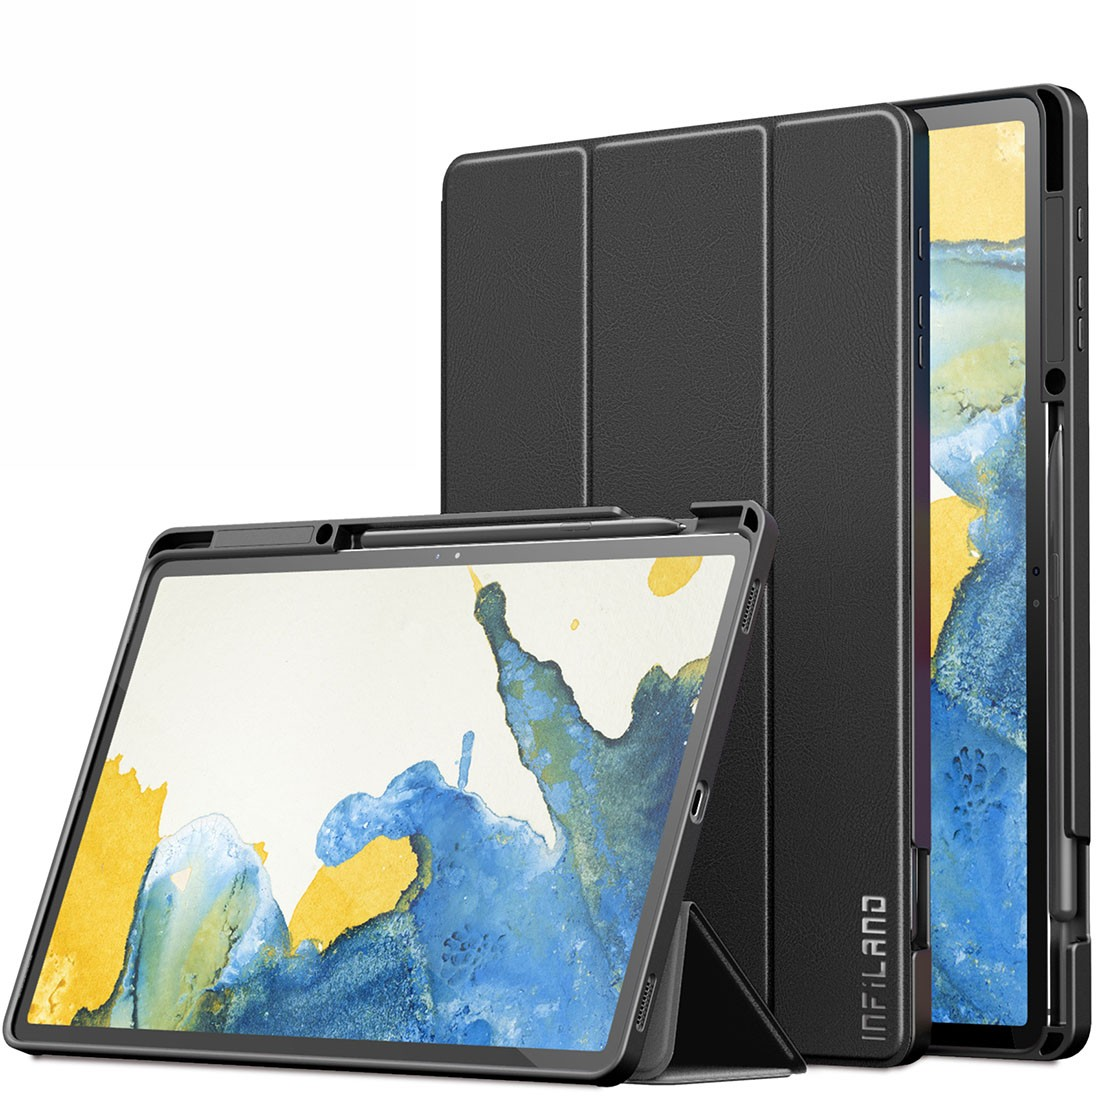 Capa Anti Impacto com Fino Acabamento Galaxy Tab S7 Plus 12.4 pol 2020 SM-T970 e SM-T975